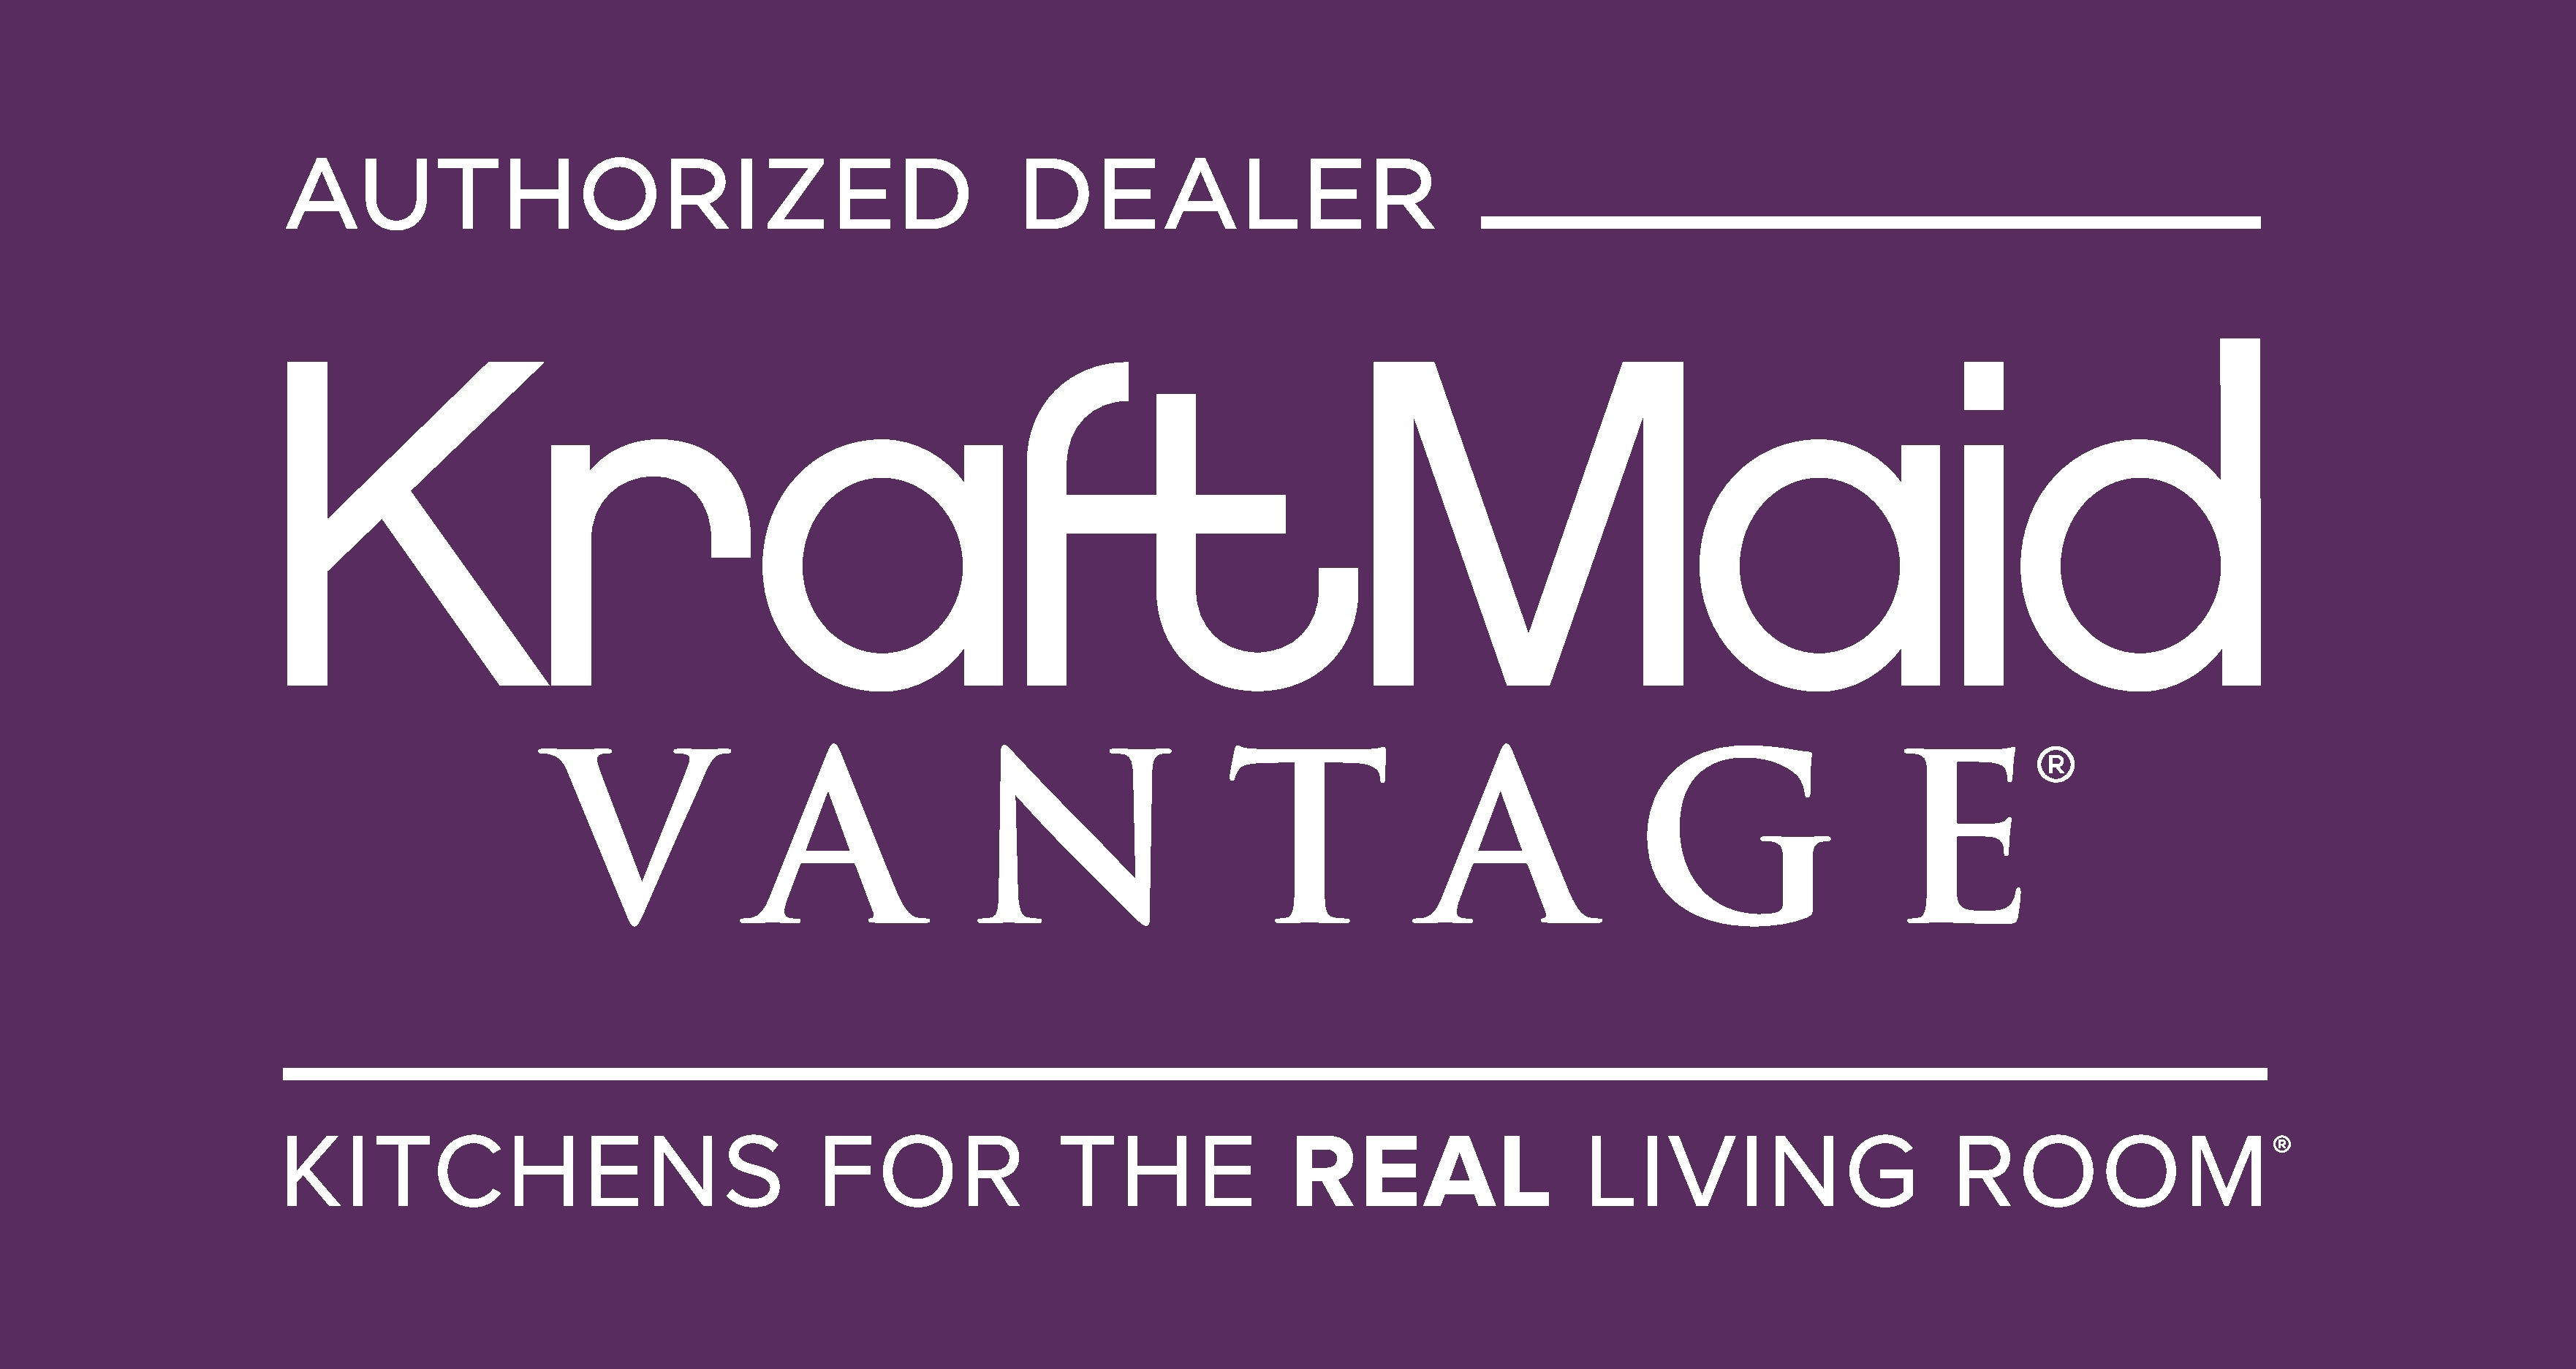 Kraftmaid Vantage Authorized Dealer